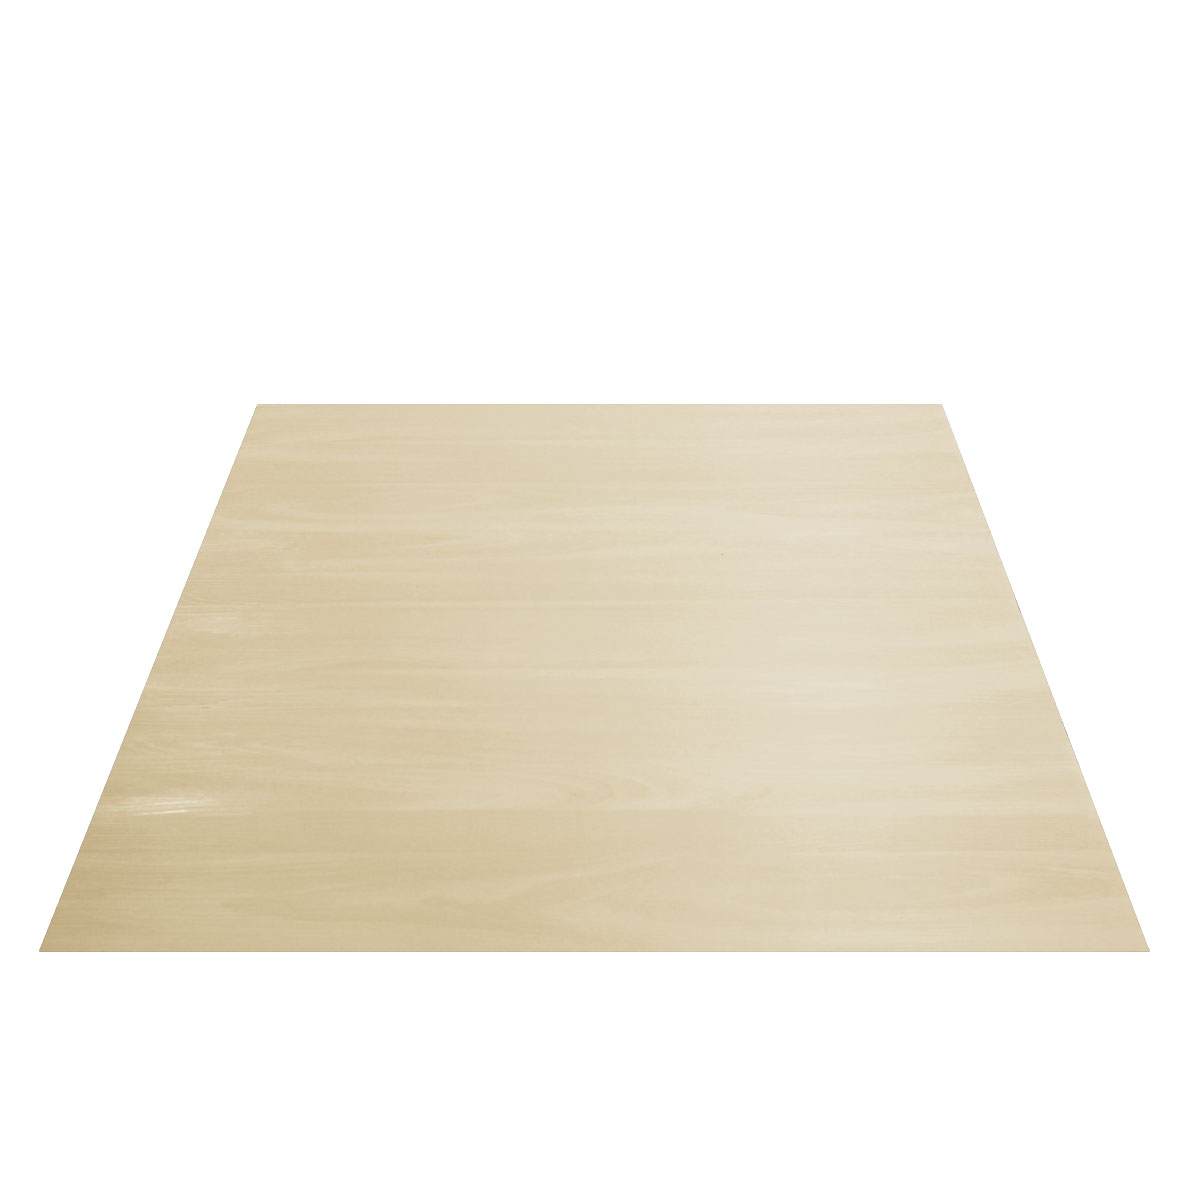 neuholz vinyl laminat selbstklebend ahorn matt. Black Bedroom Furniture Sets. Home Design Ideas